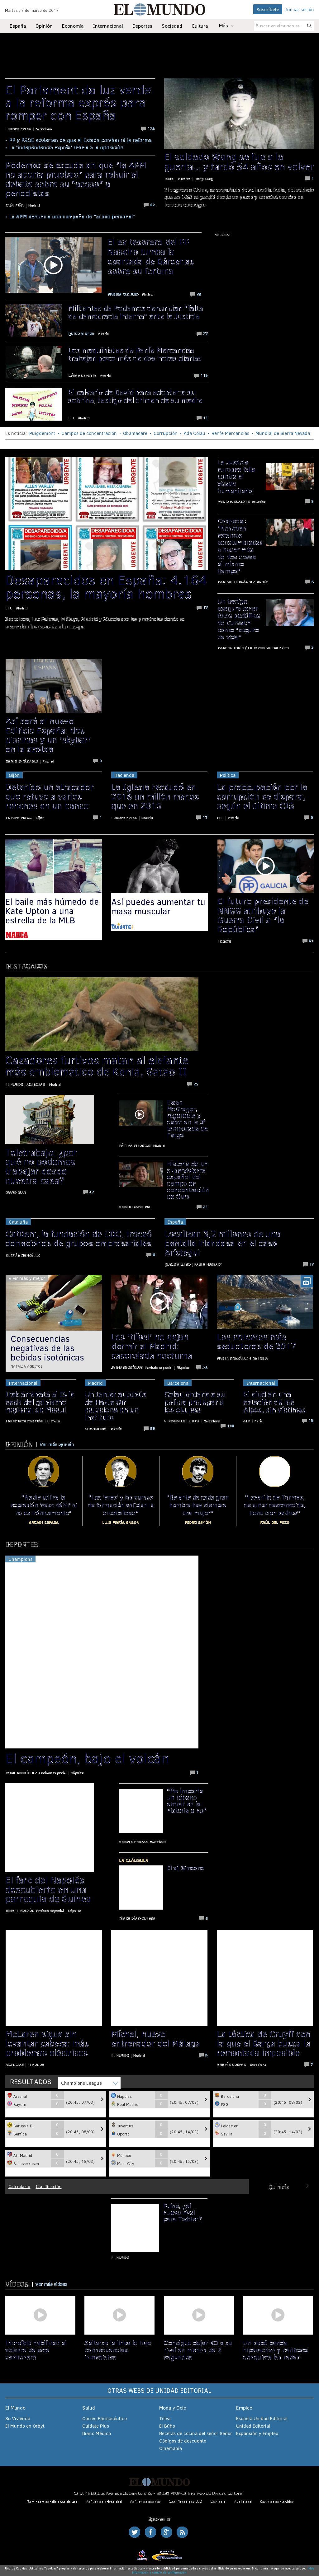 El Mundo at Tuesday March 7, 2017, 2:14 p.m. UTC